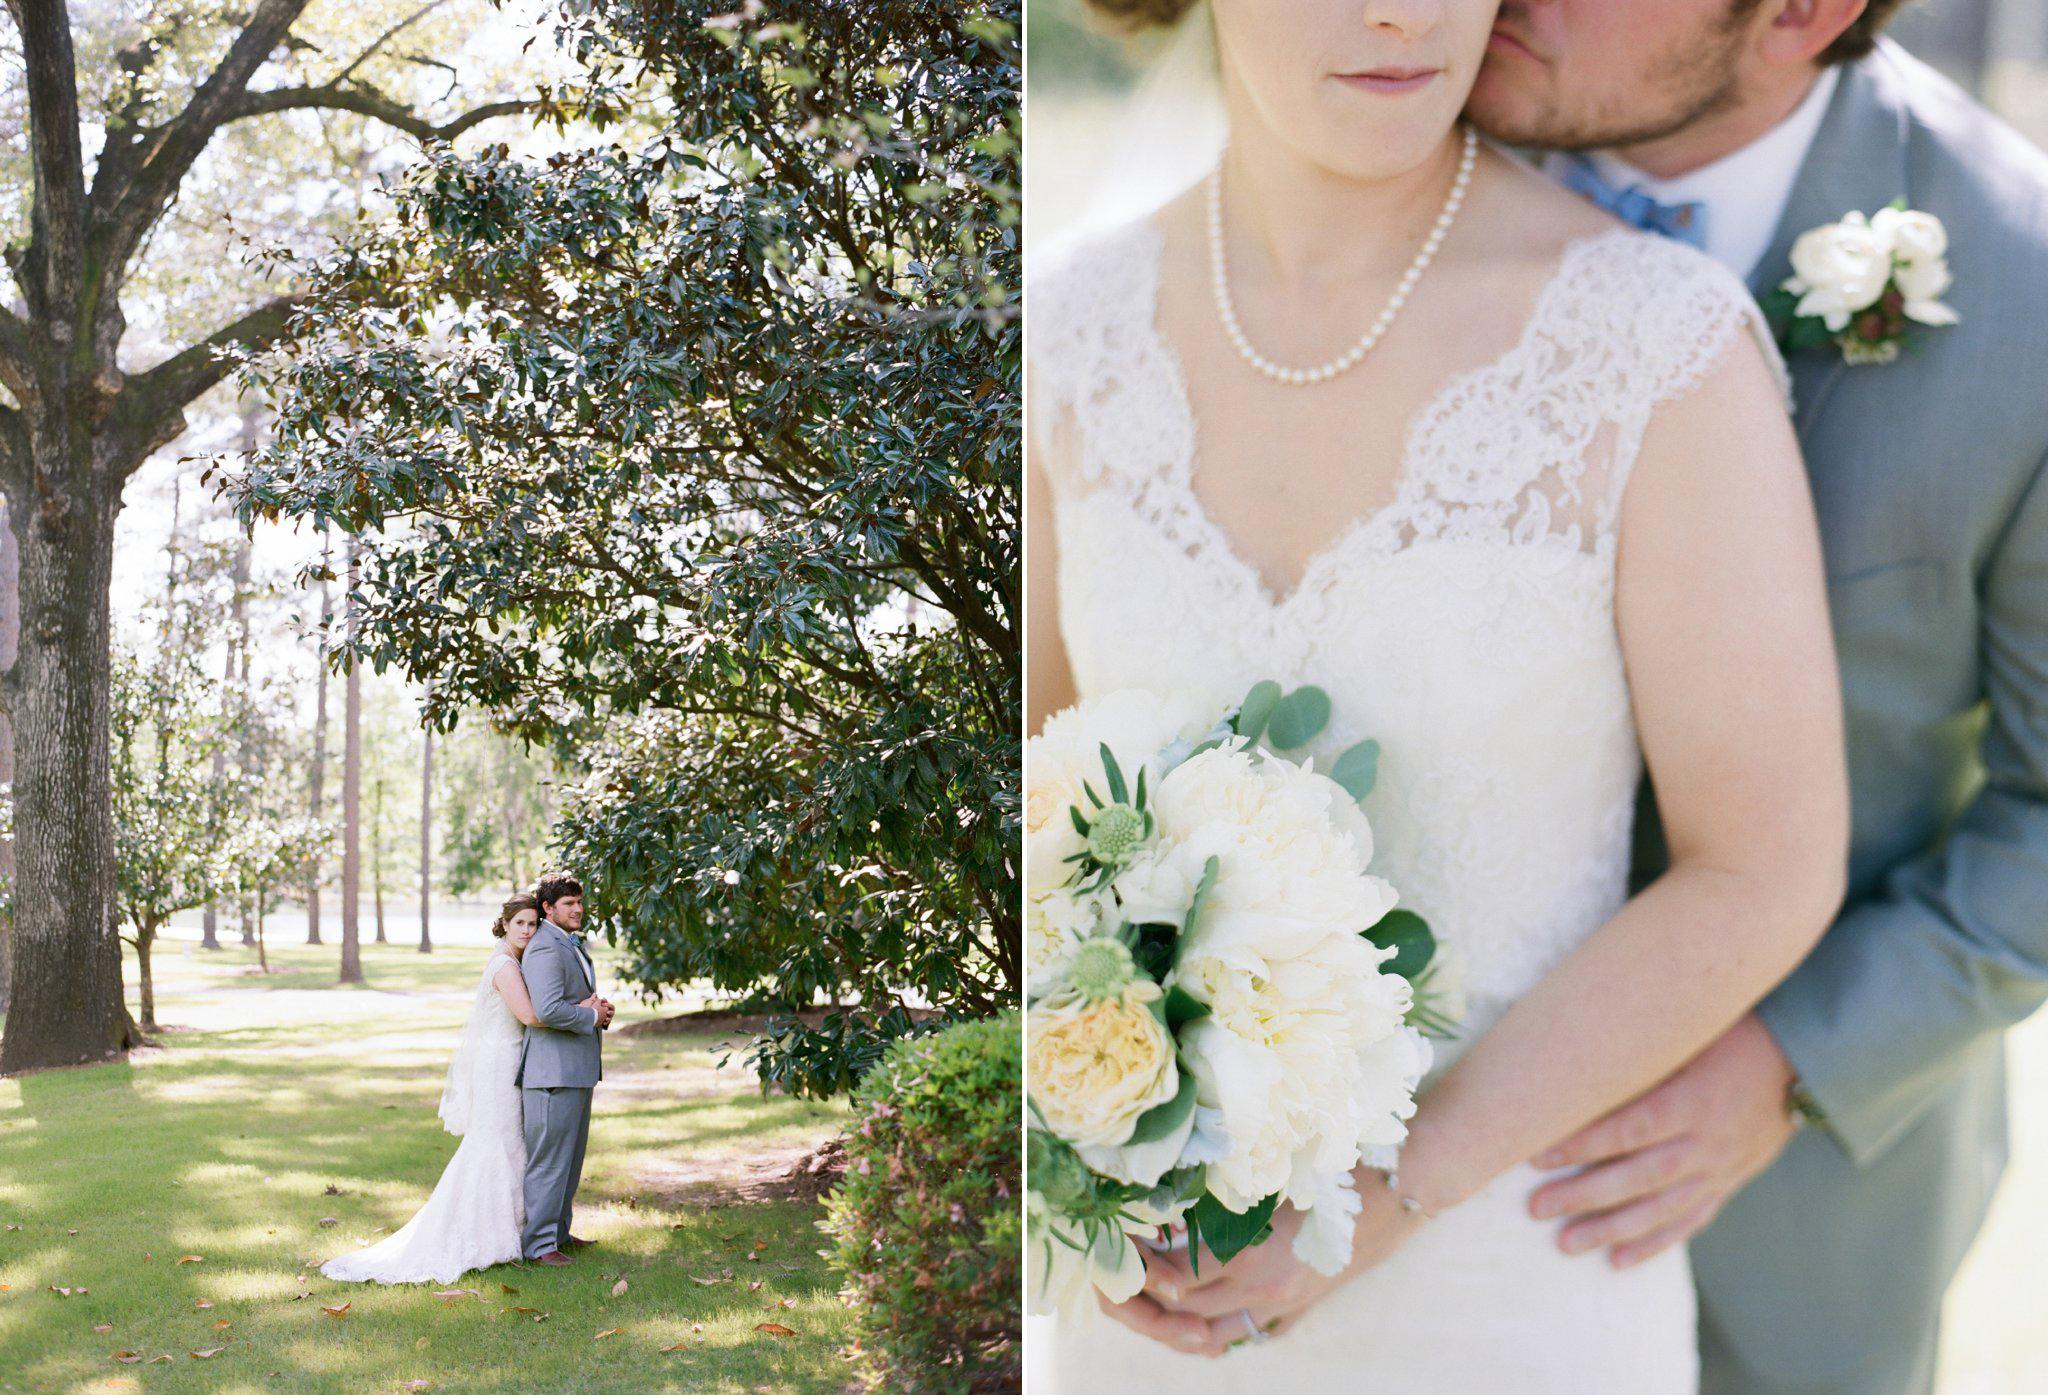 ecila farm wedding albany georgia wedding photographer shannon griffin photography-51.jpg